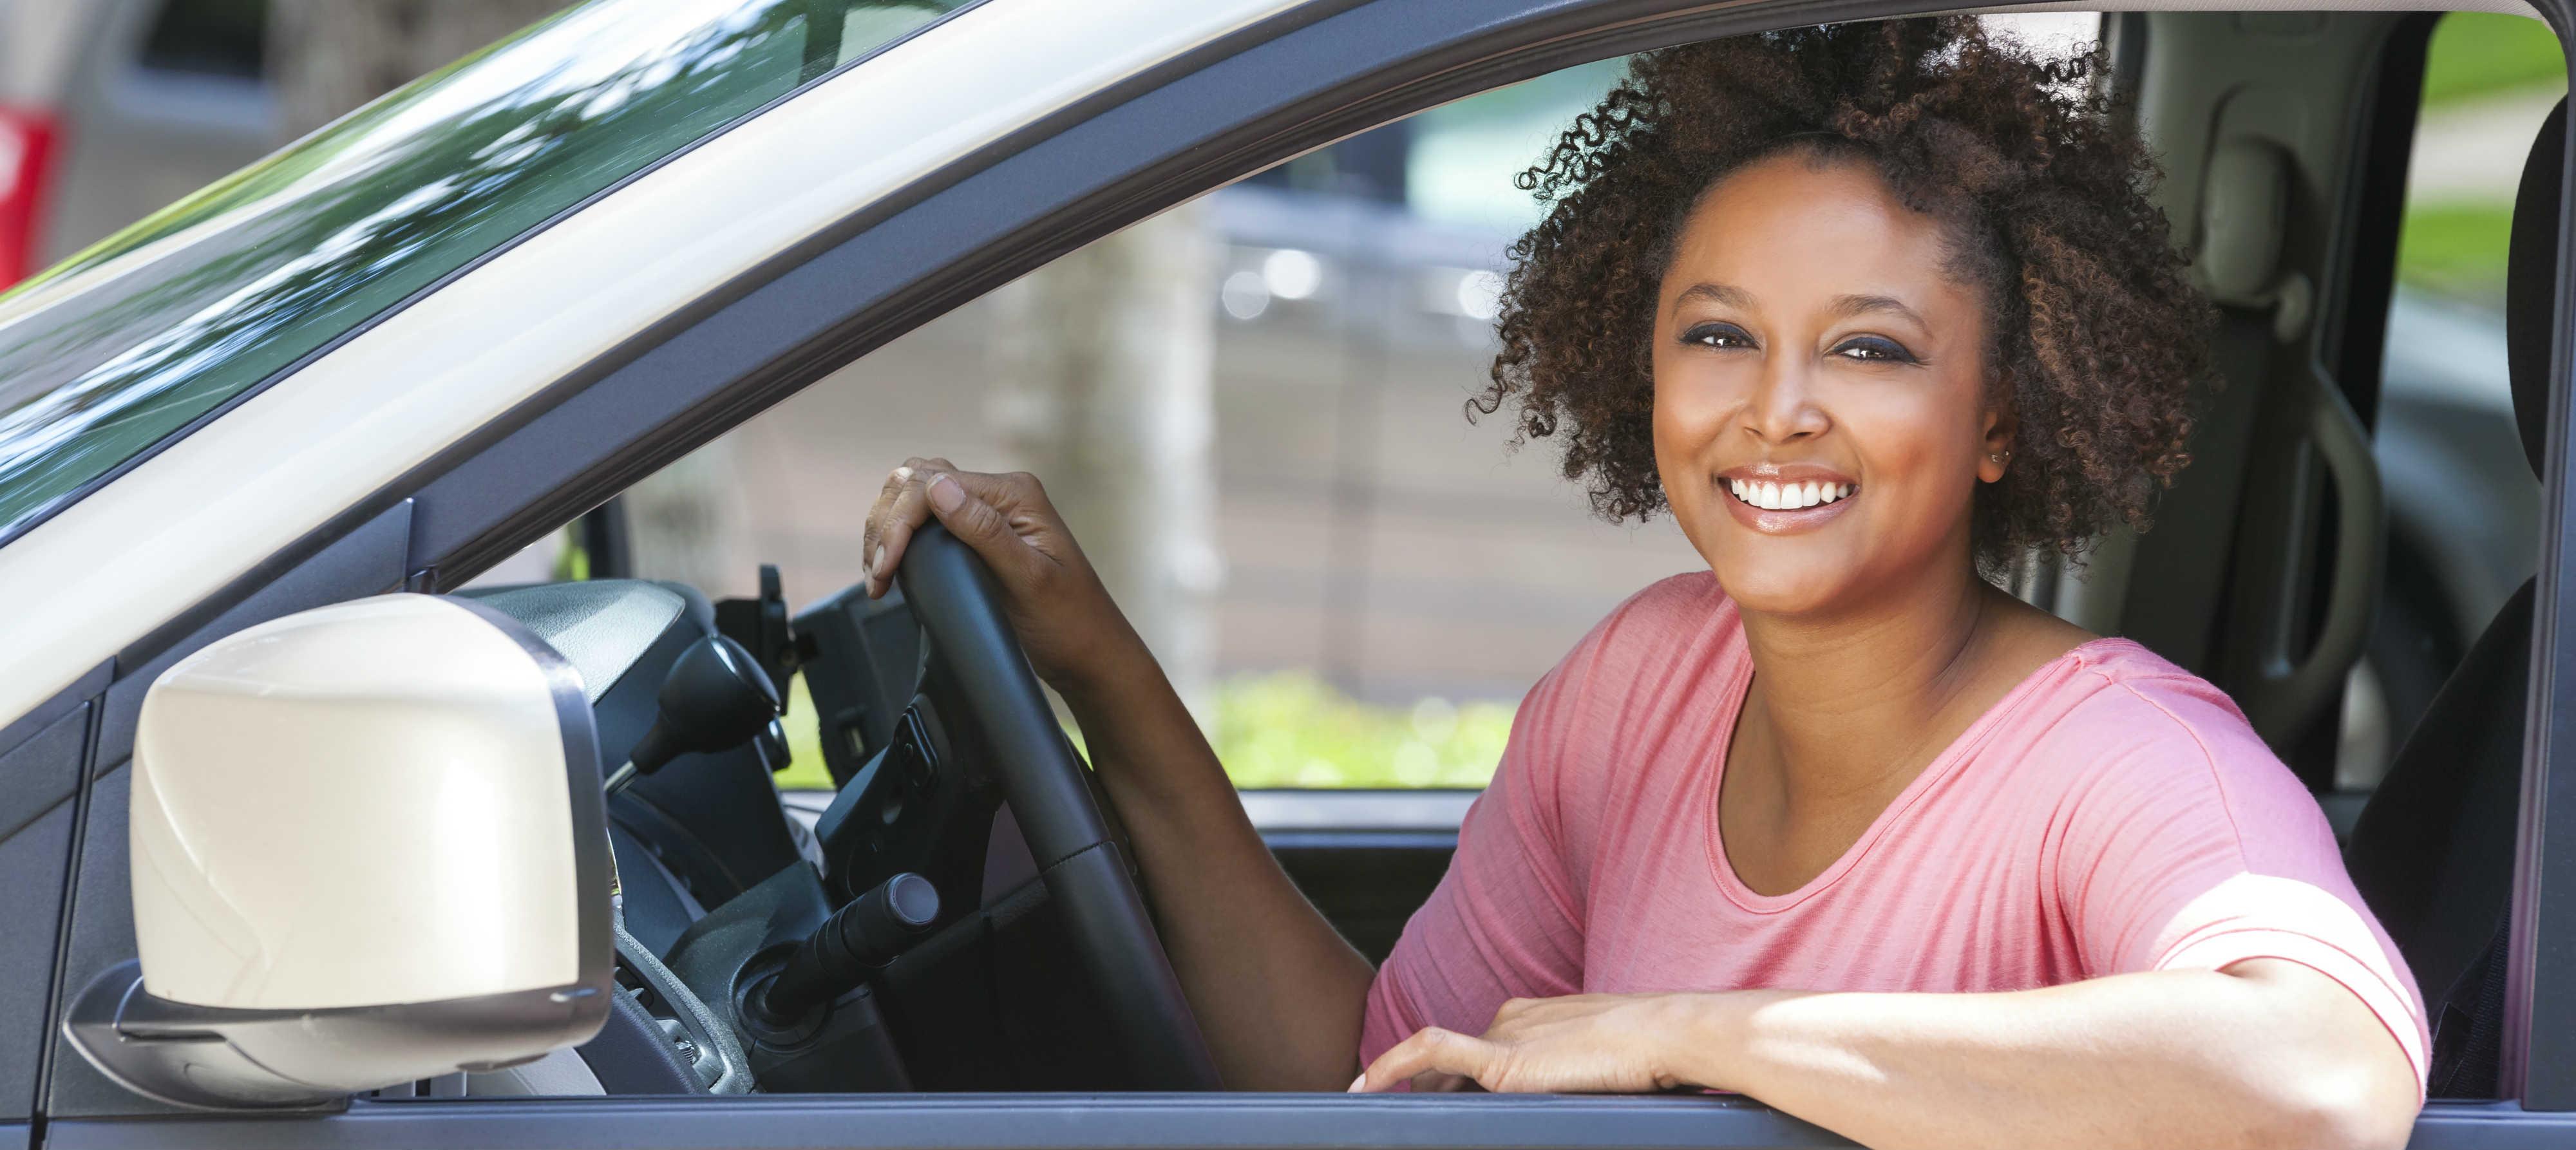 Rv Rental London Ontario >> Car Rental London - Compare Rental Cars at VroomVroomVroom